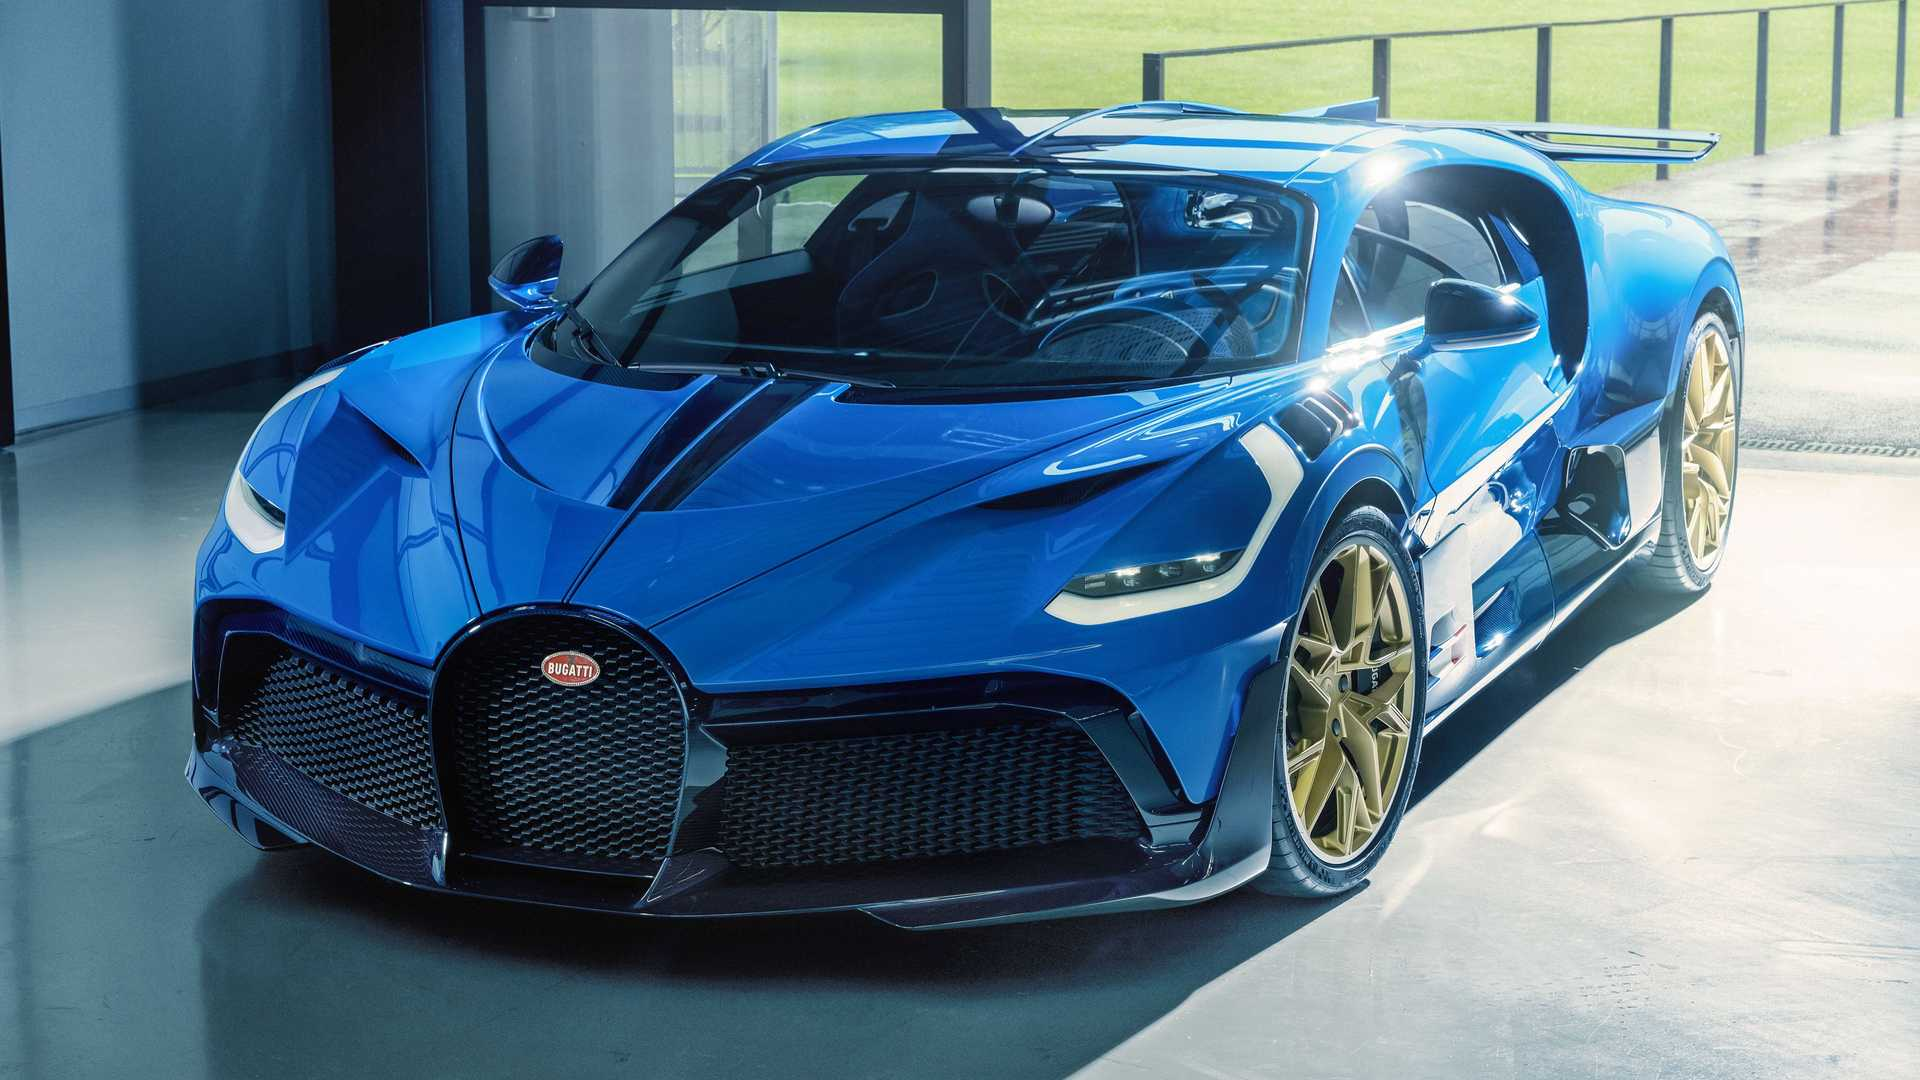 https://cdn.motor1.com/images/mgl/JJ9V6/s6/bugatti-divo-front-view.jpg